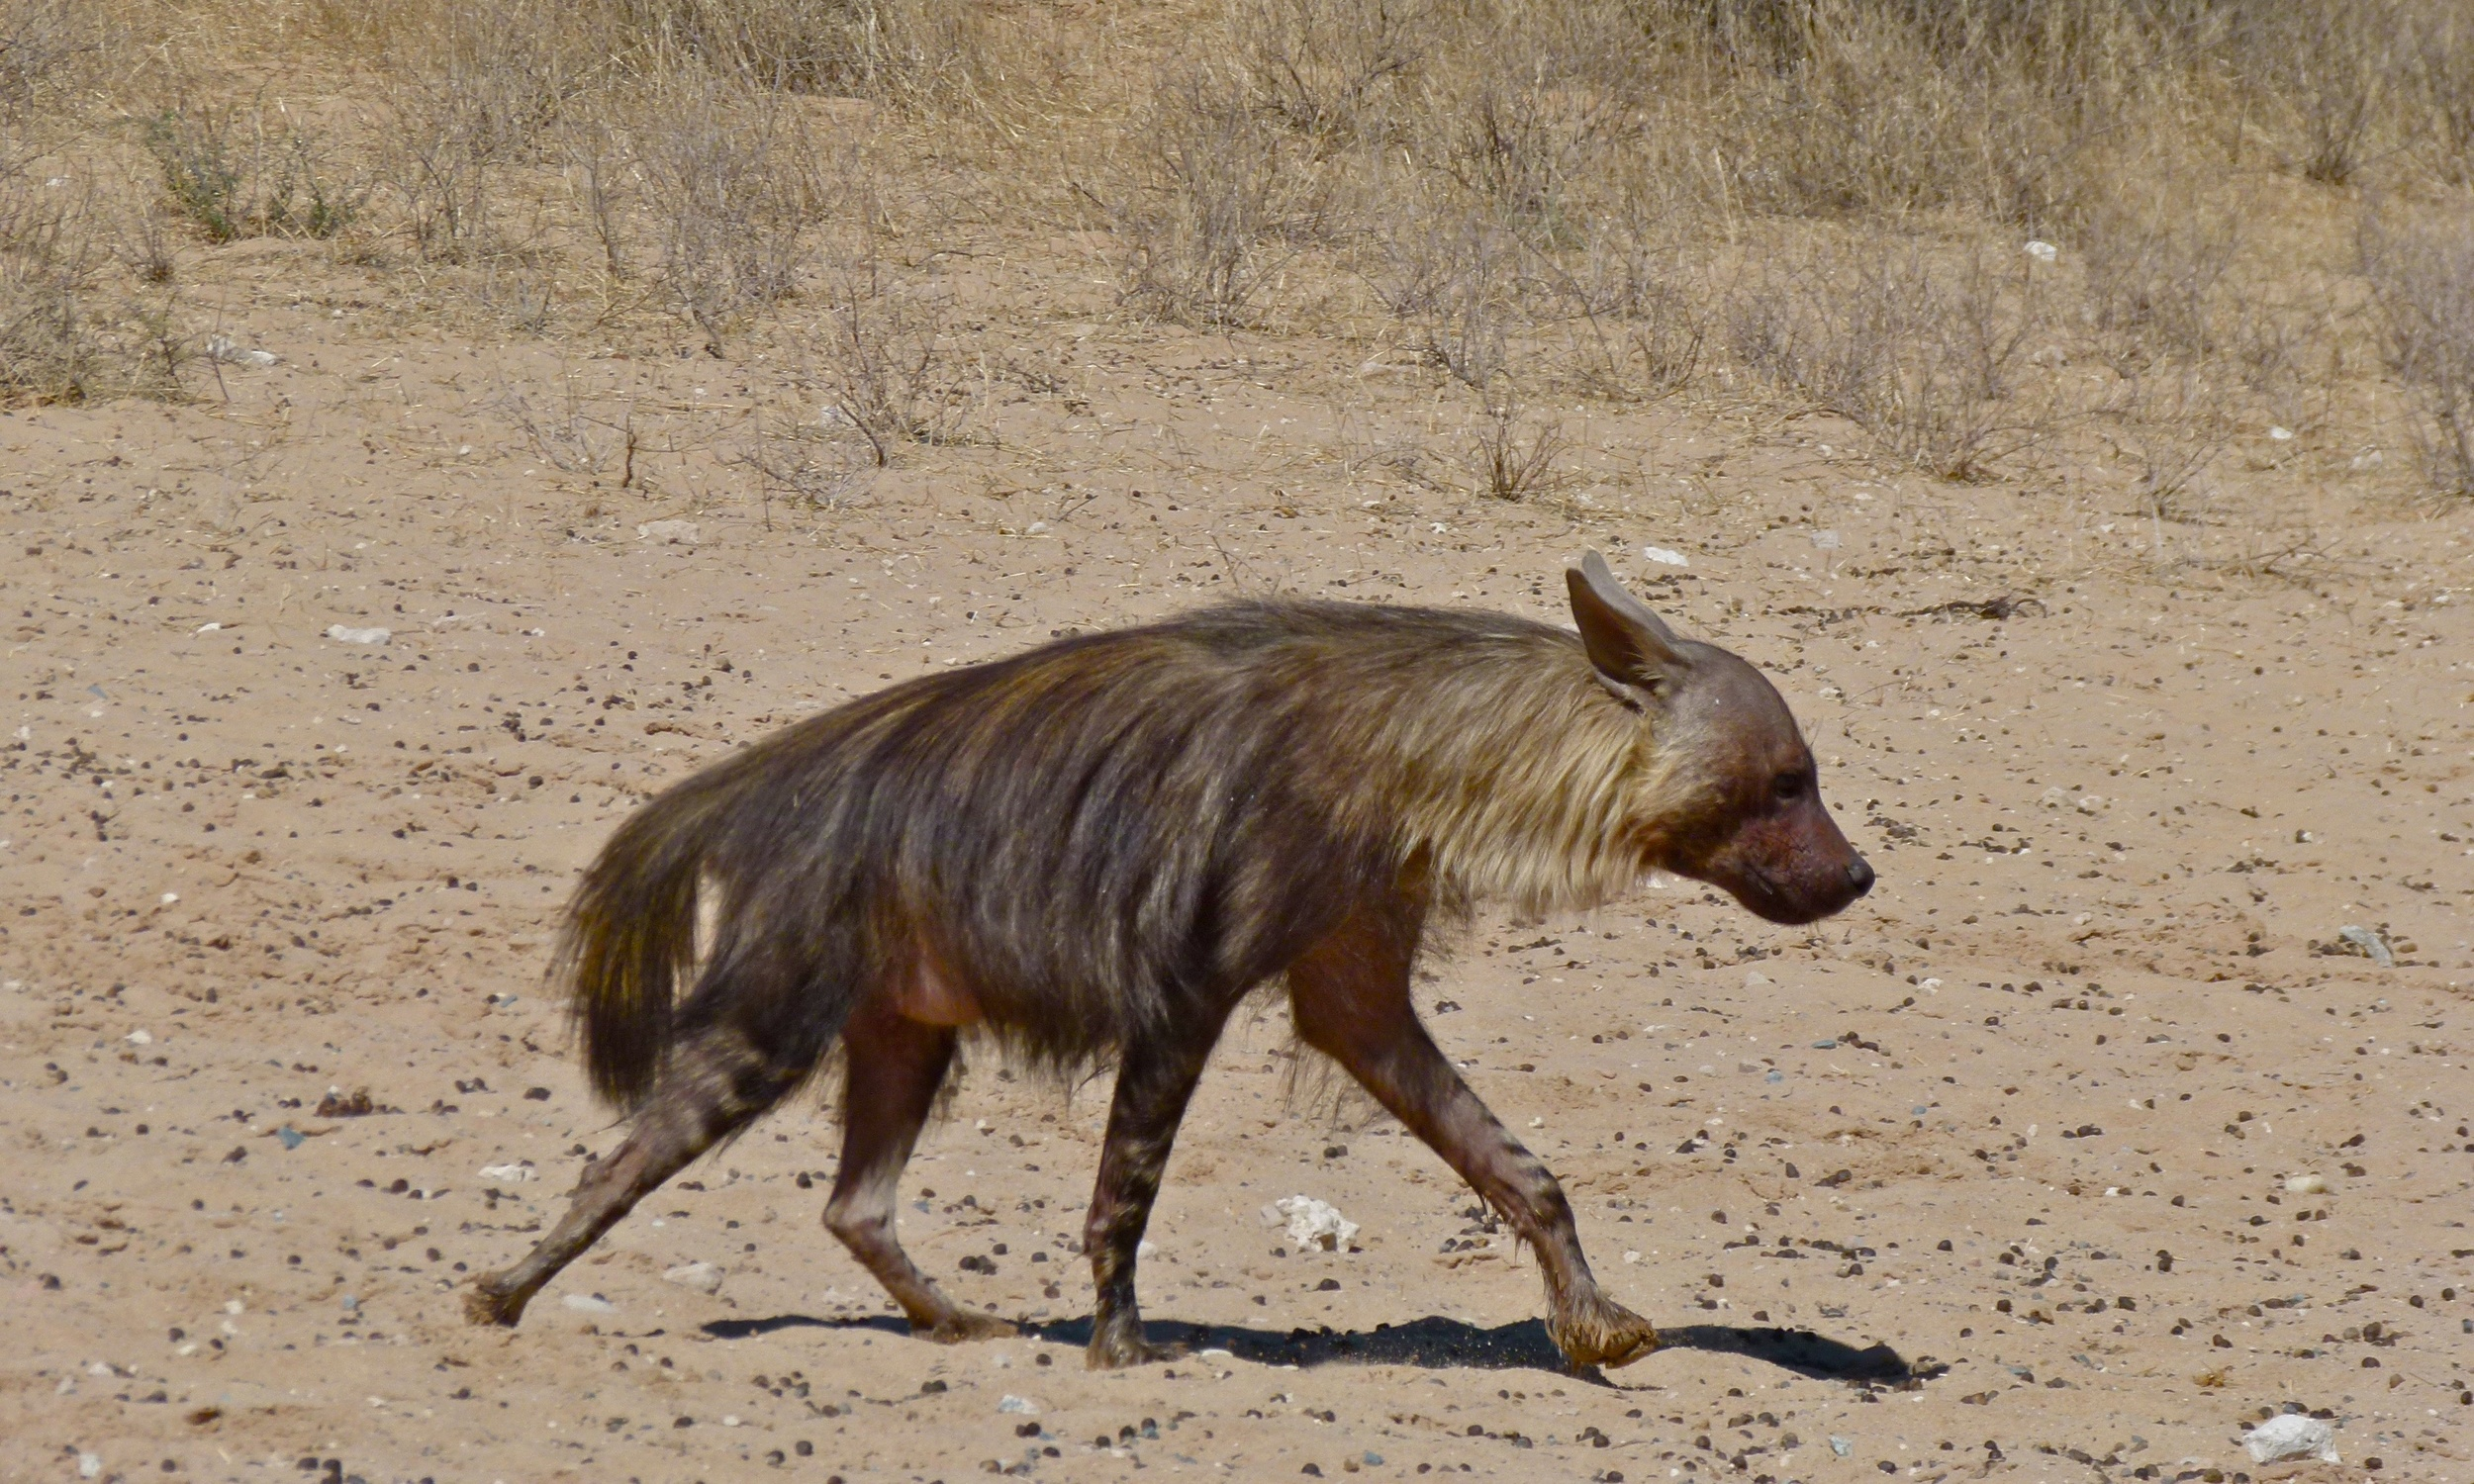 Brown hyena |  Bernard Dupont/Wikimedia Commons  [ CC BY-SA 2.0 ]